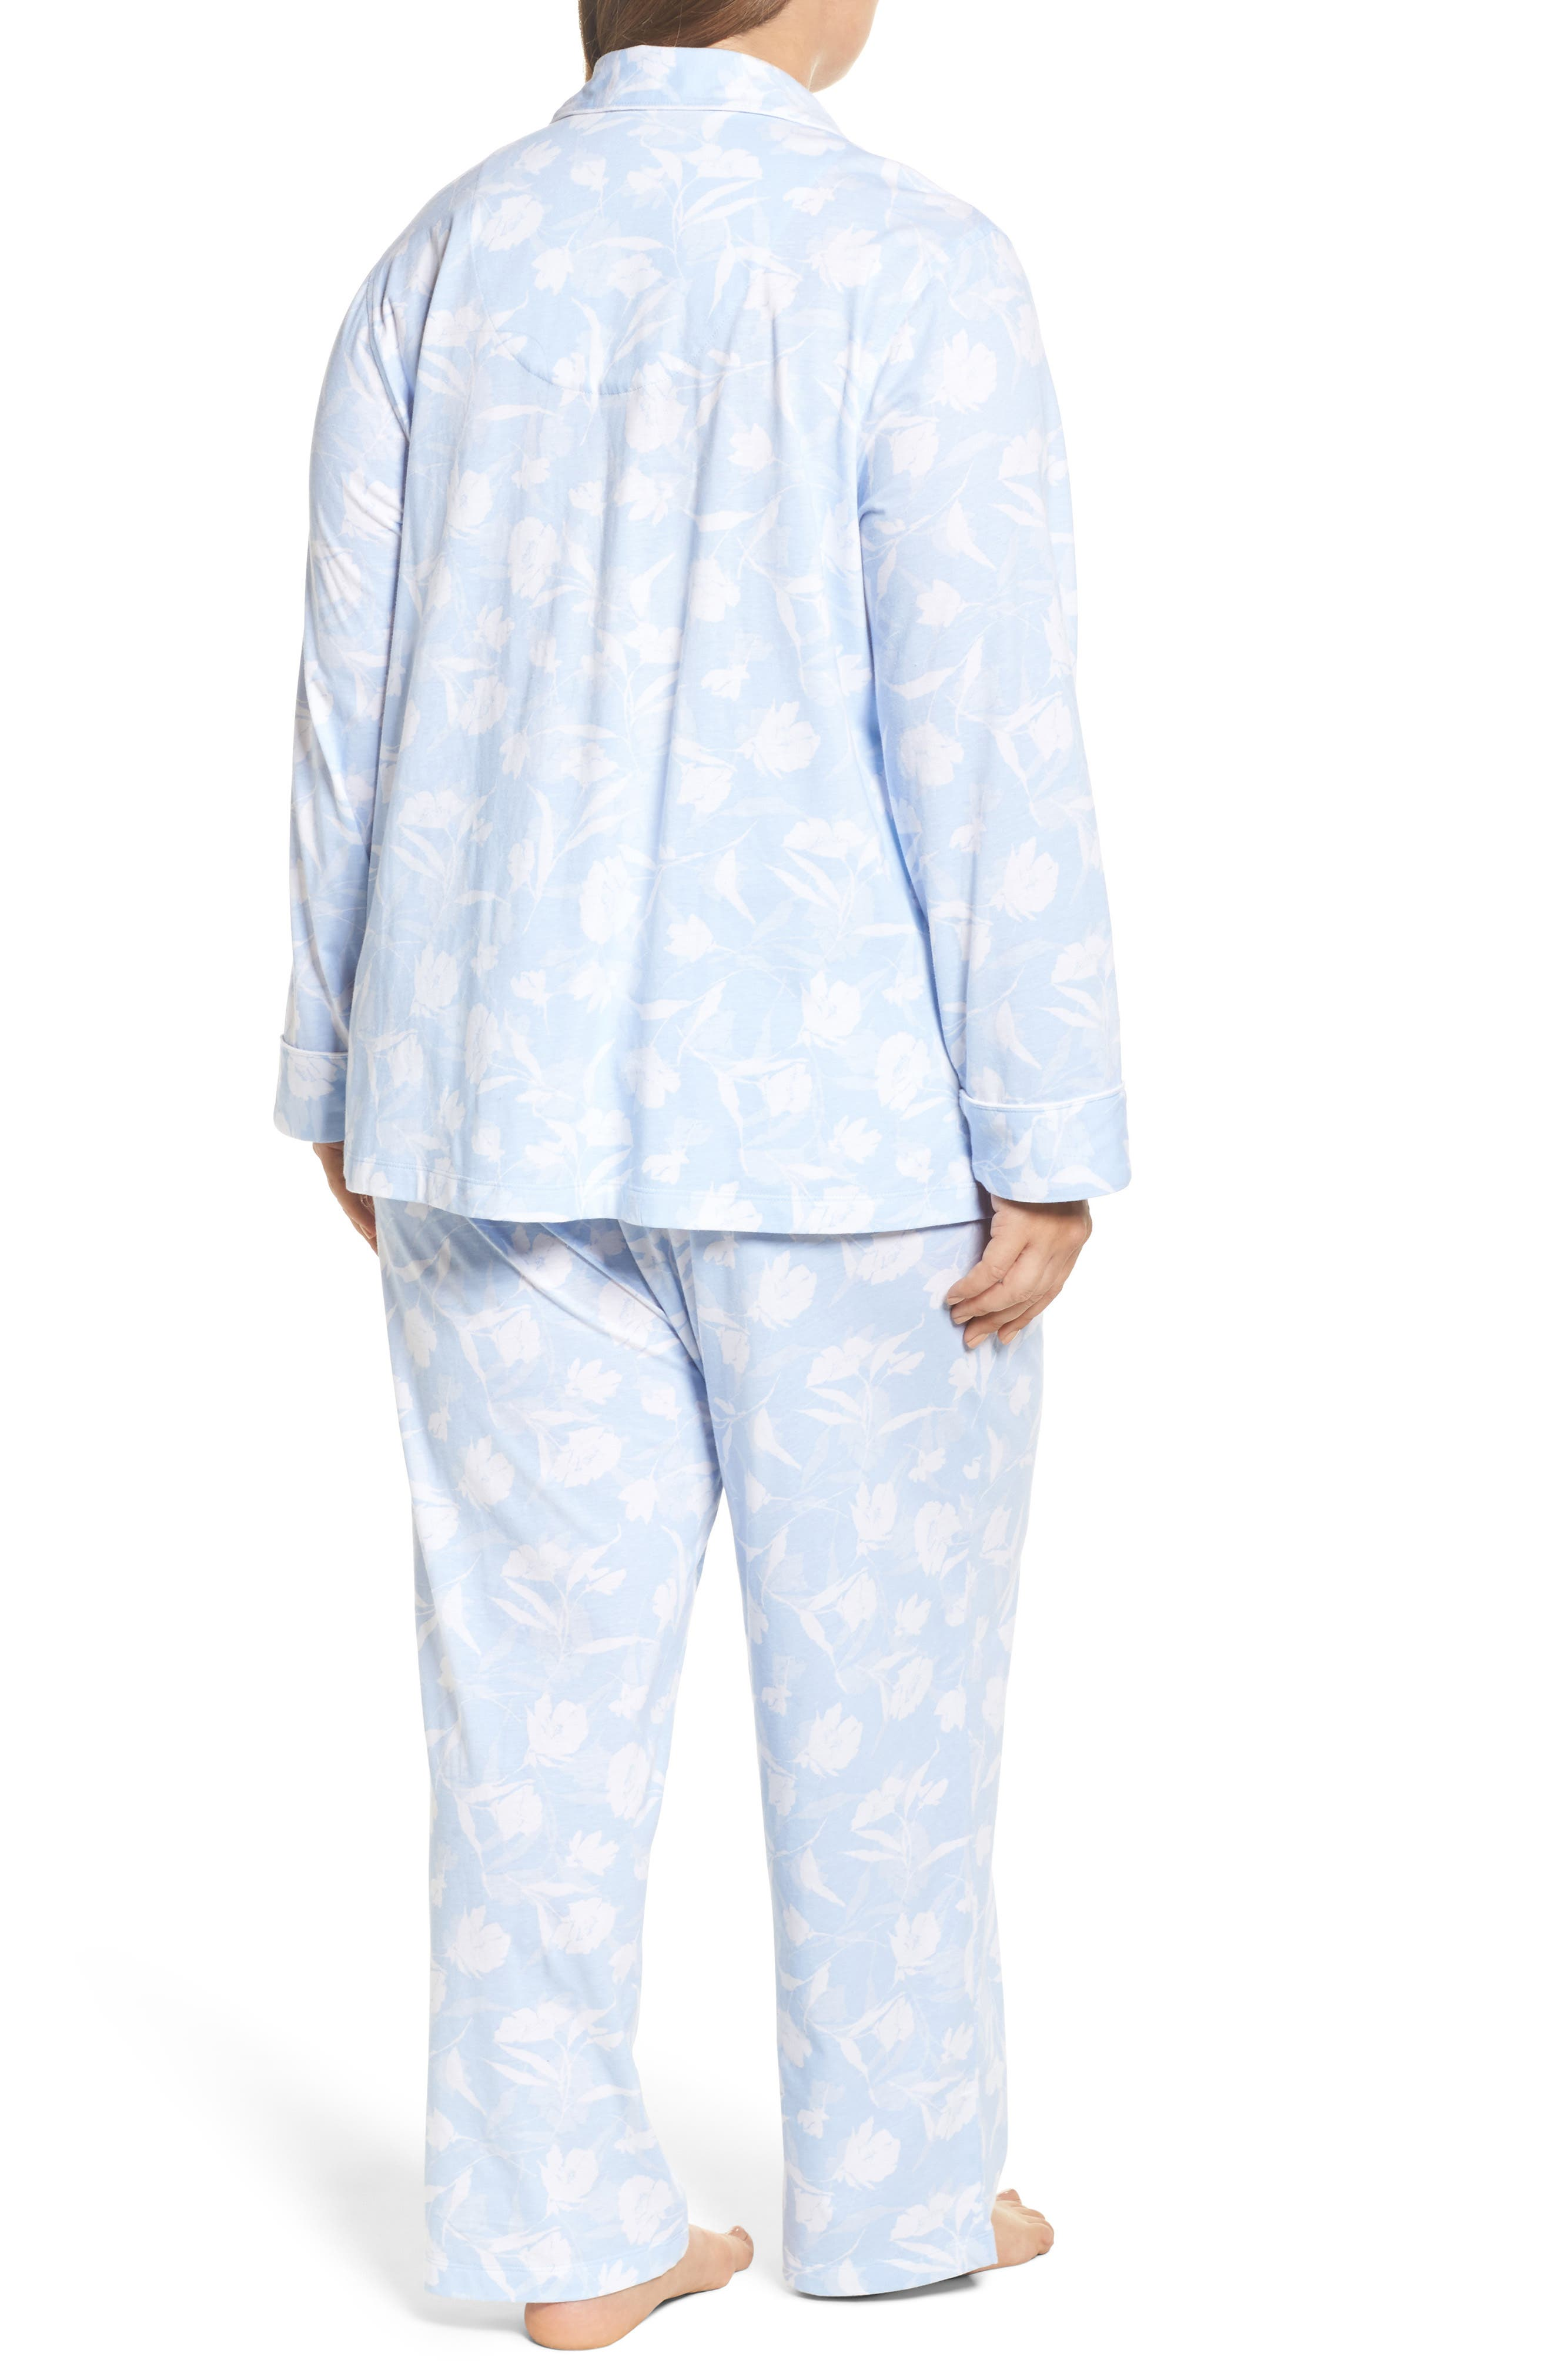 Floral Print Jersey Pajamas,                             Alternate thumbnail 2, color,                             Blue Monotone Floral